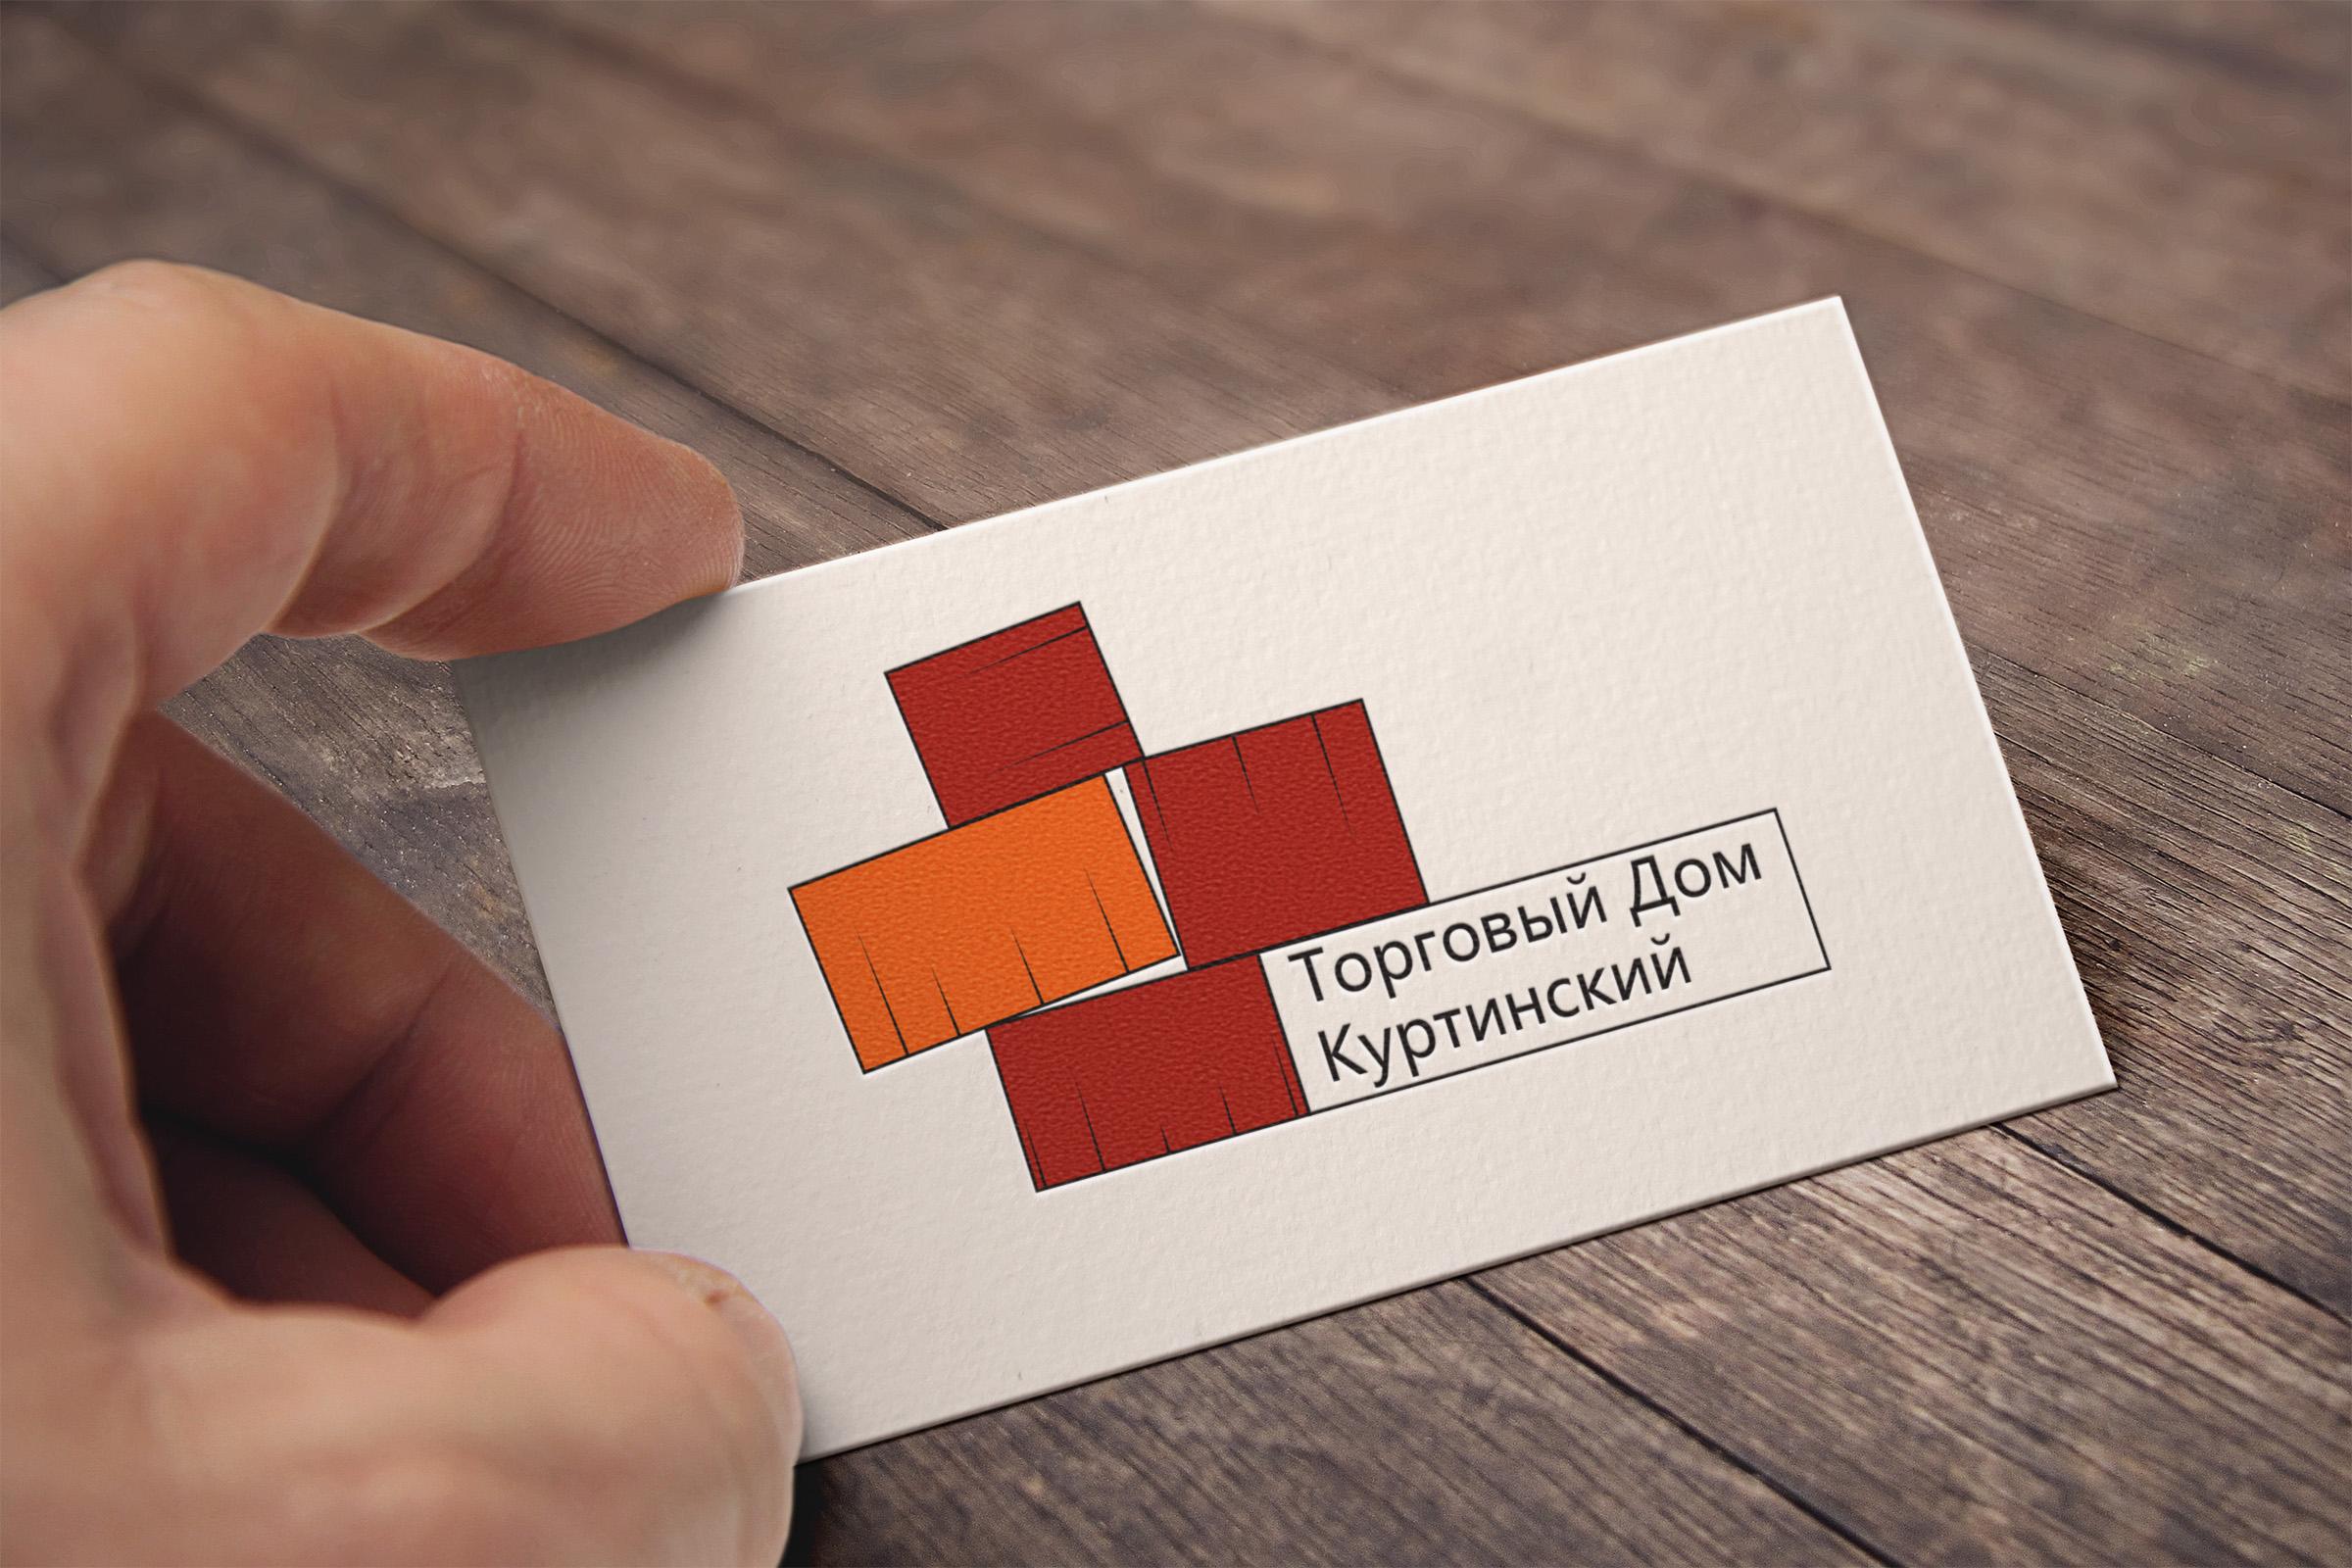 Логотип для камнедобывающей компании фото f_2355b9a6bc51cd8a.jpg